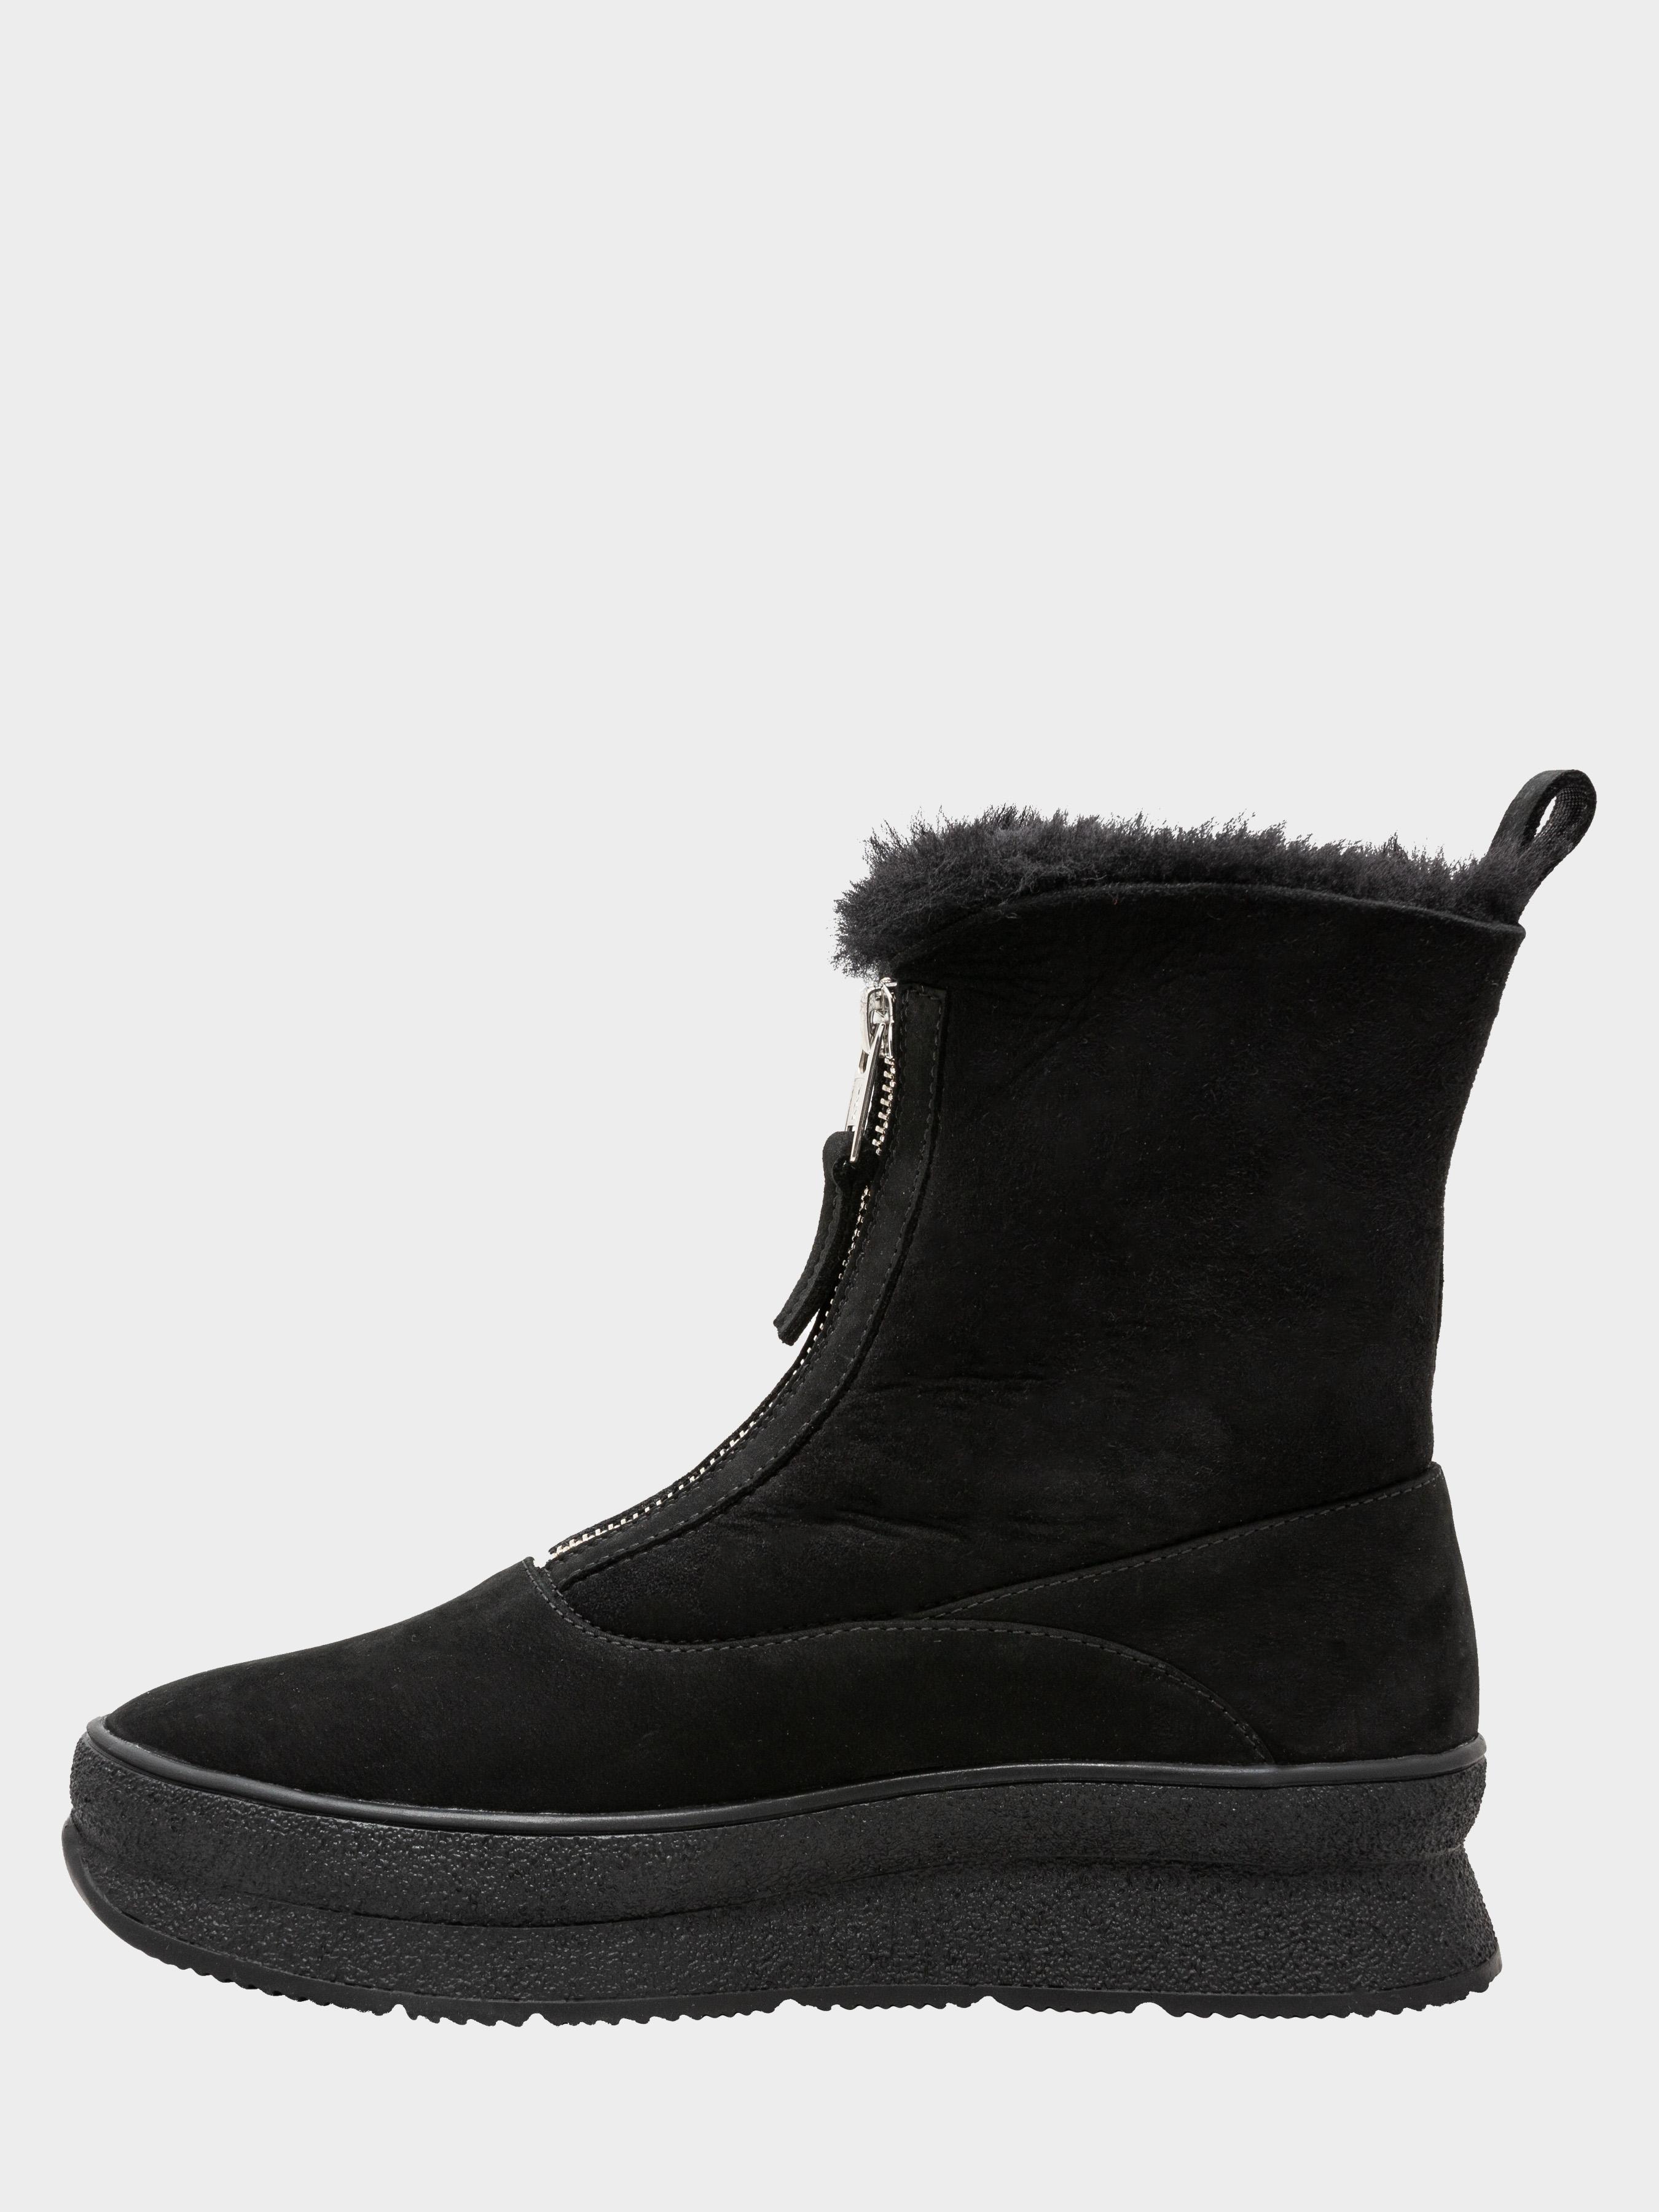 Ботинки для женщин Ботинки женские ENZO VERRATTI 18-1462-8m цена, 2017